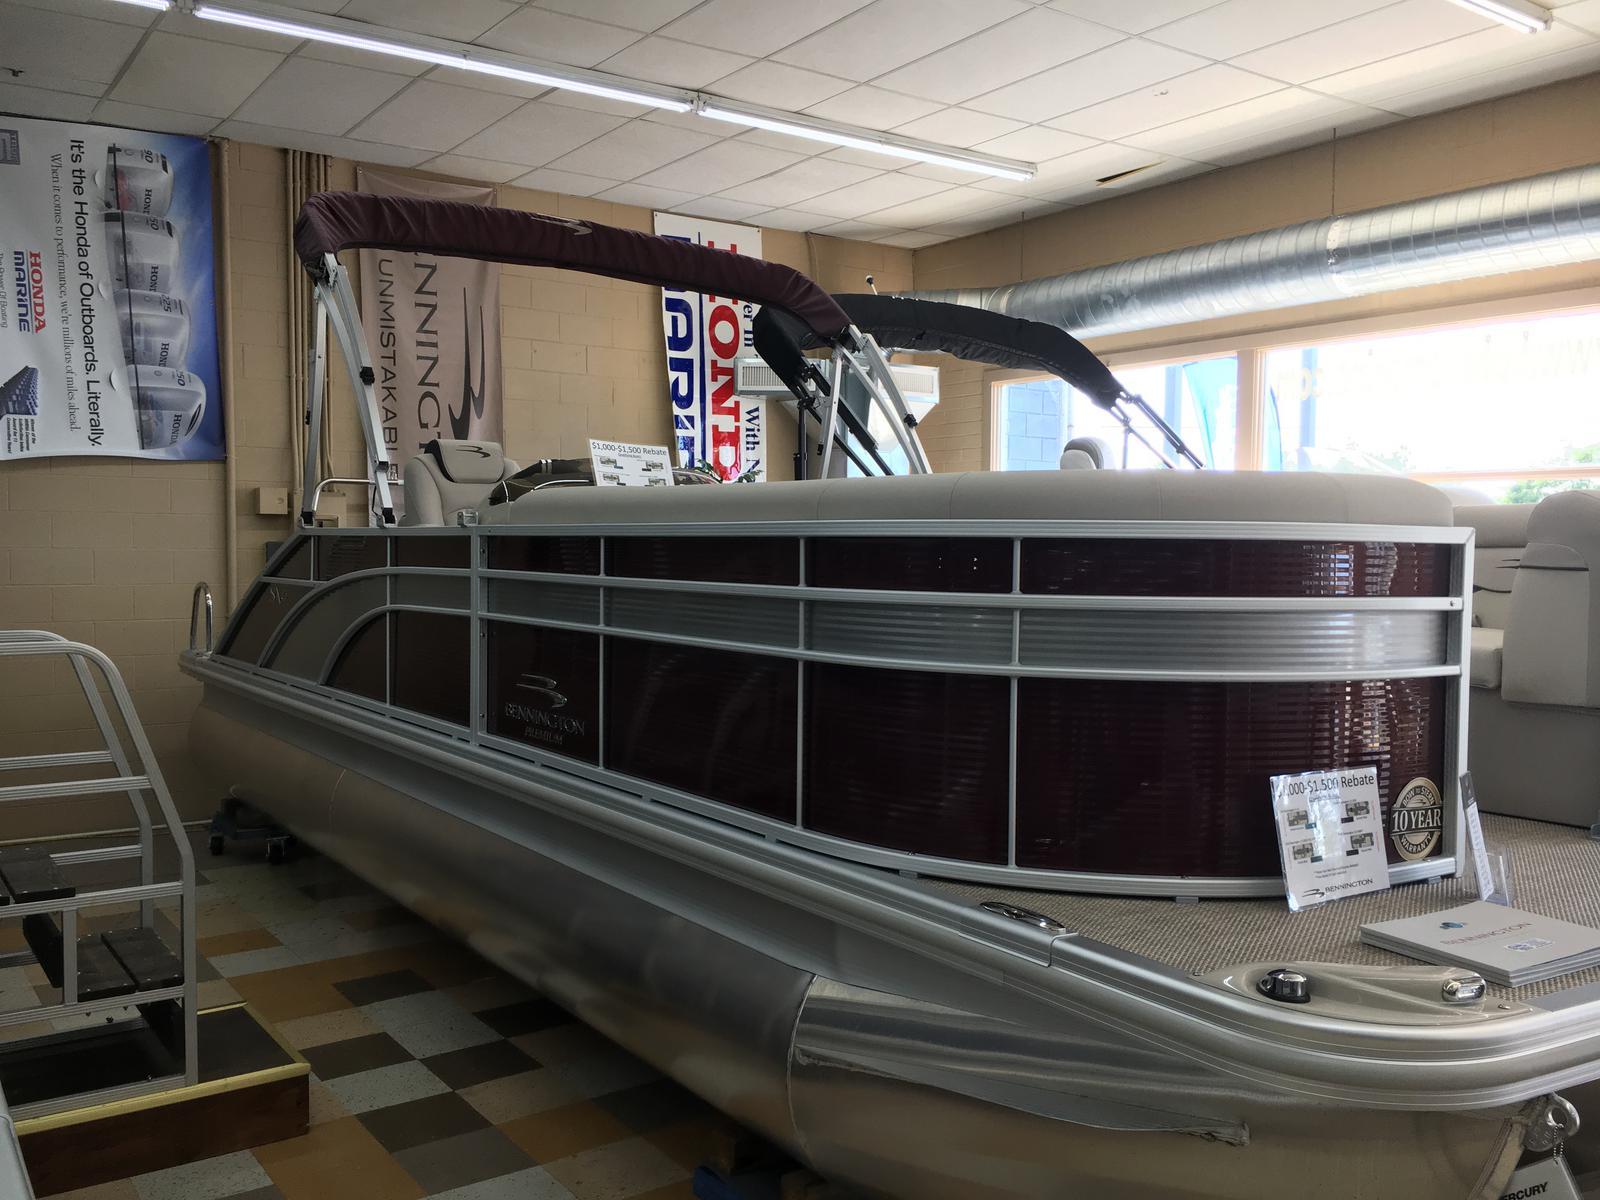 Inventory Huber's Marine La Porte, IN (800) 374-8985